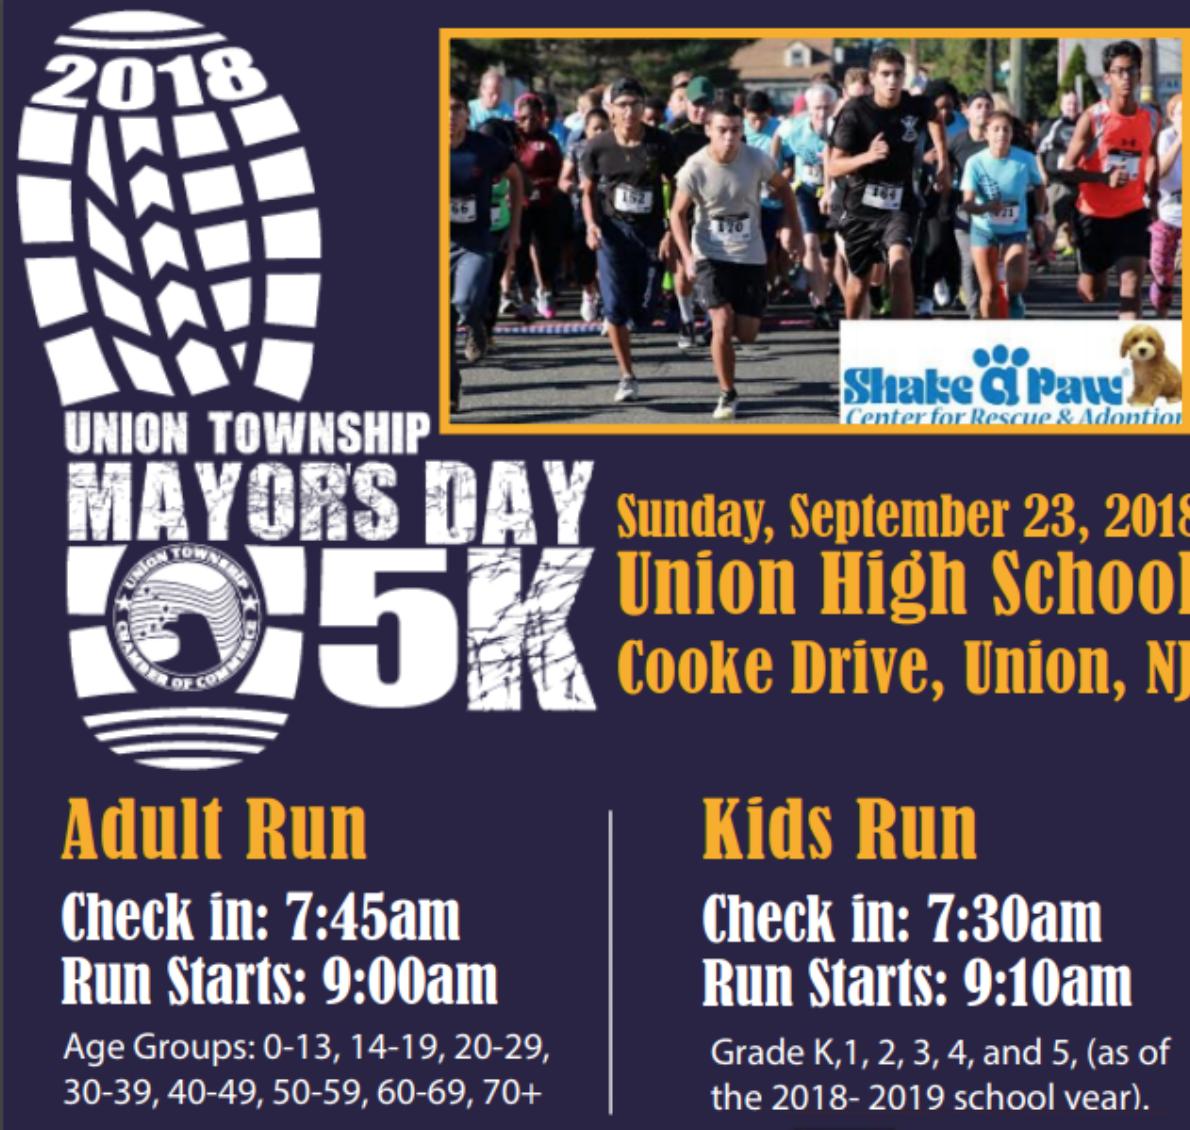 Union Chamber Kicks off Mayor's Day 5K